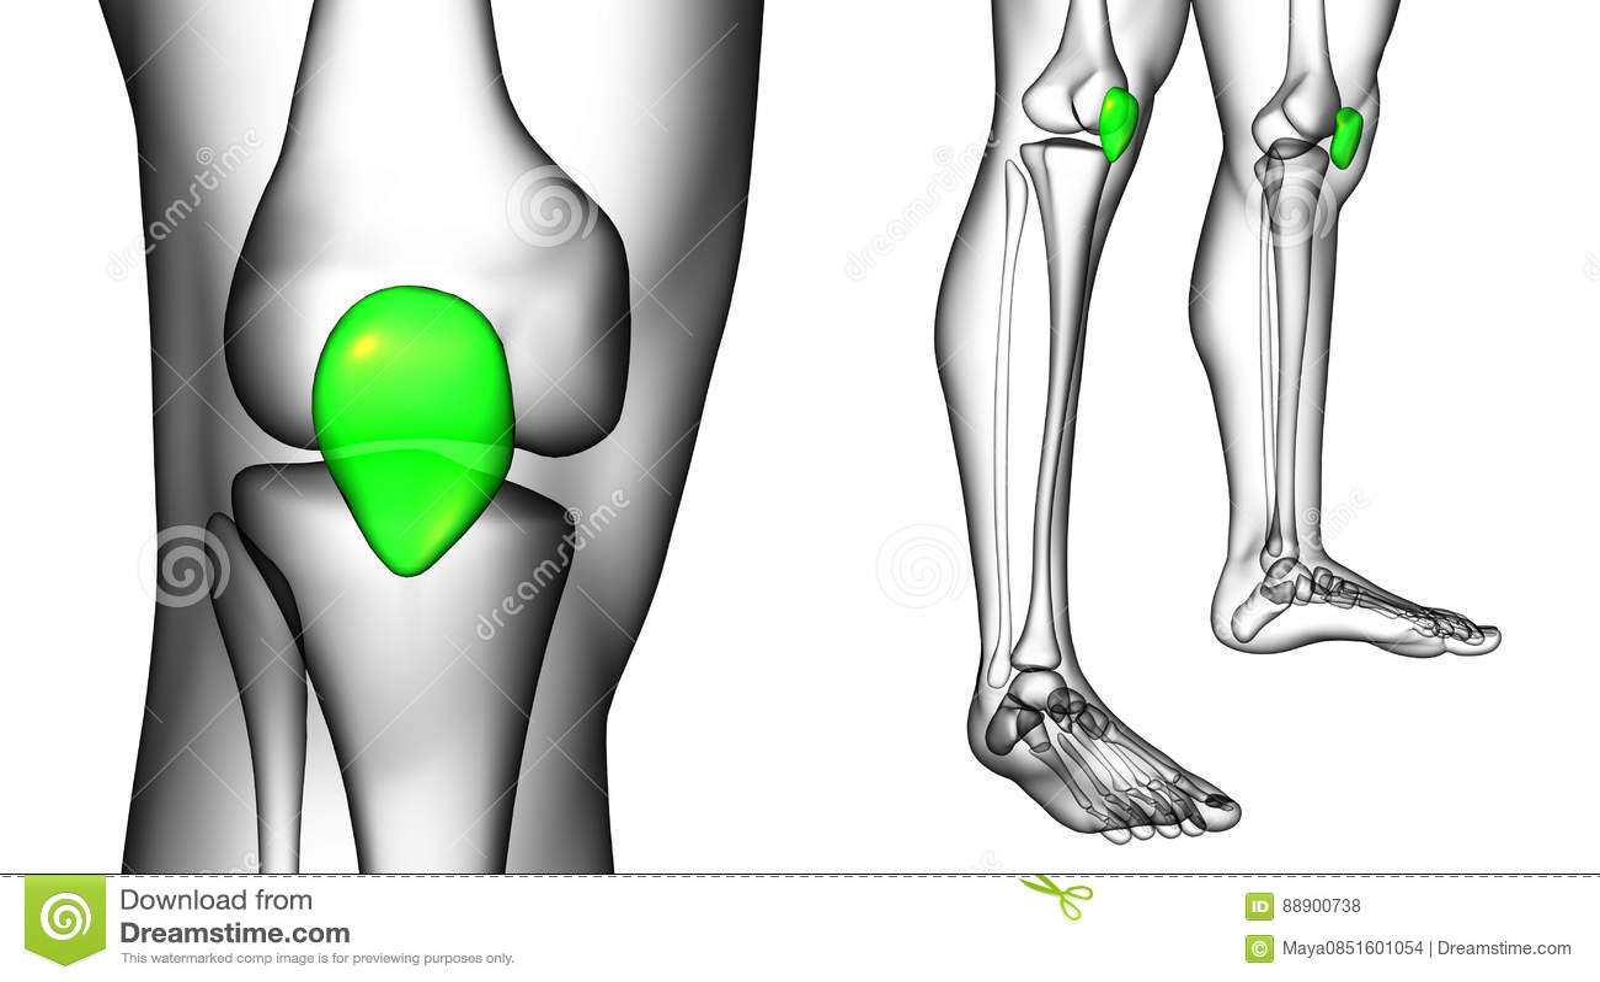 Patella bone stock illustration. Illustration of patella - 88900738